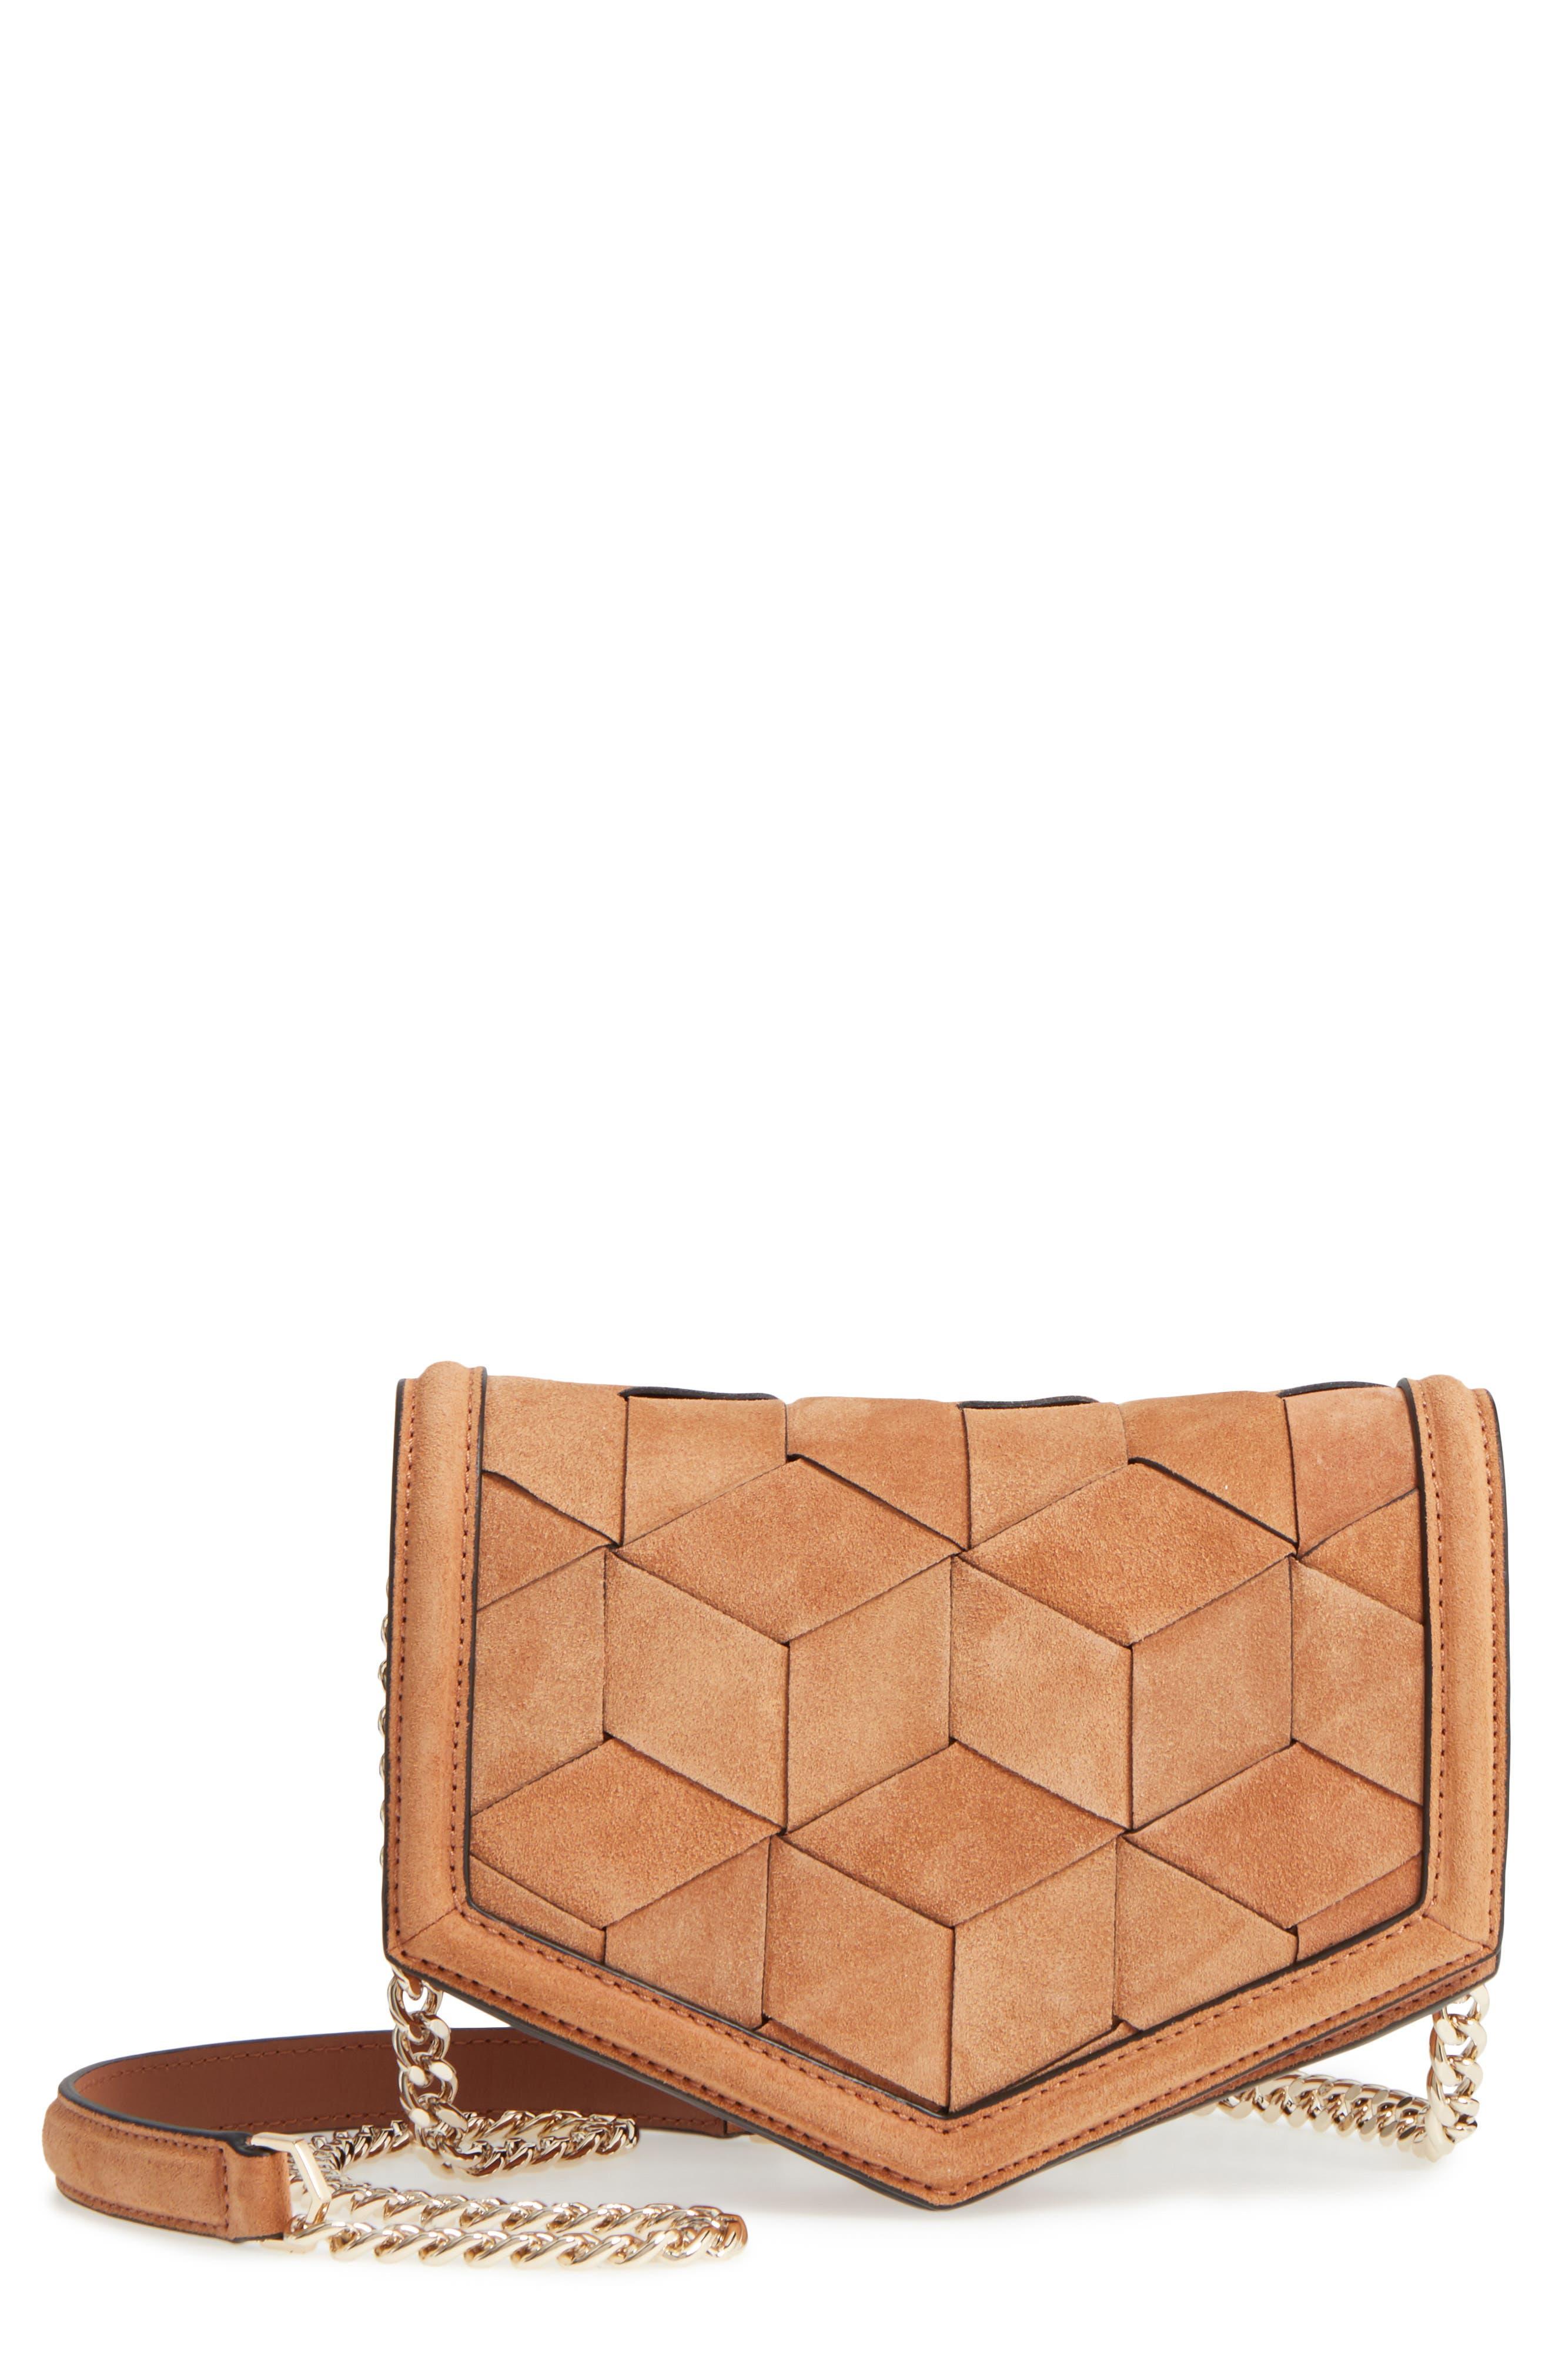 Alternate Image 1 Selected - Welden Jaunt Woven Calfskin Suede Wallet on a Chain